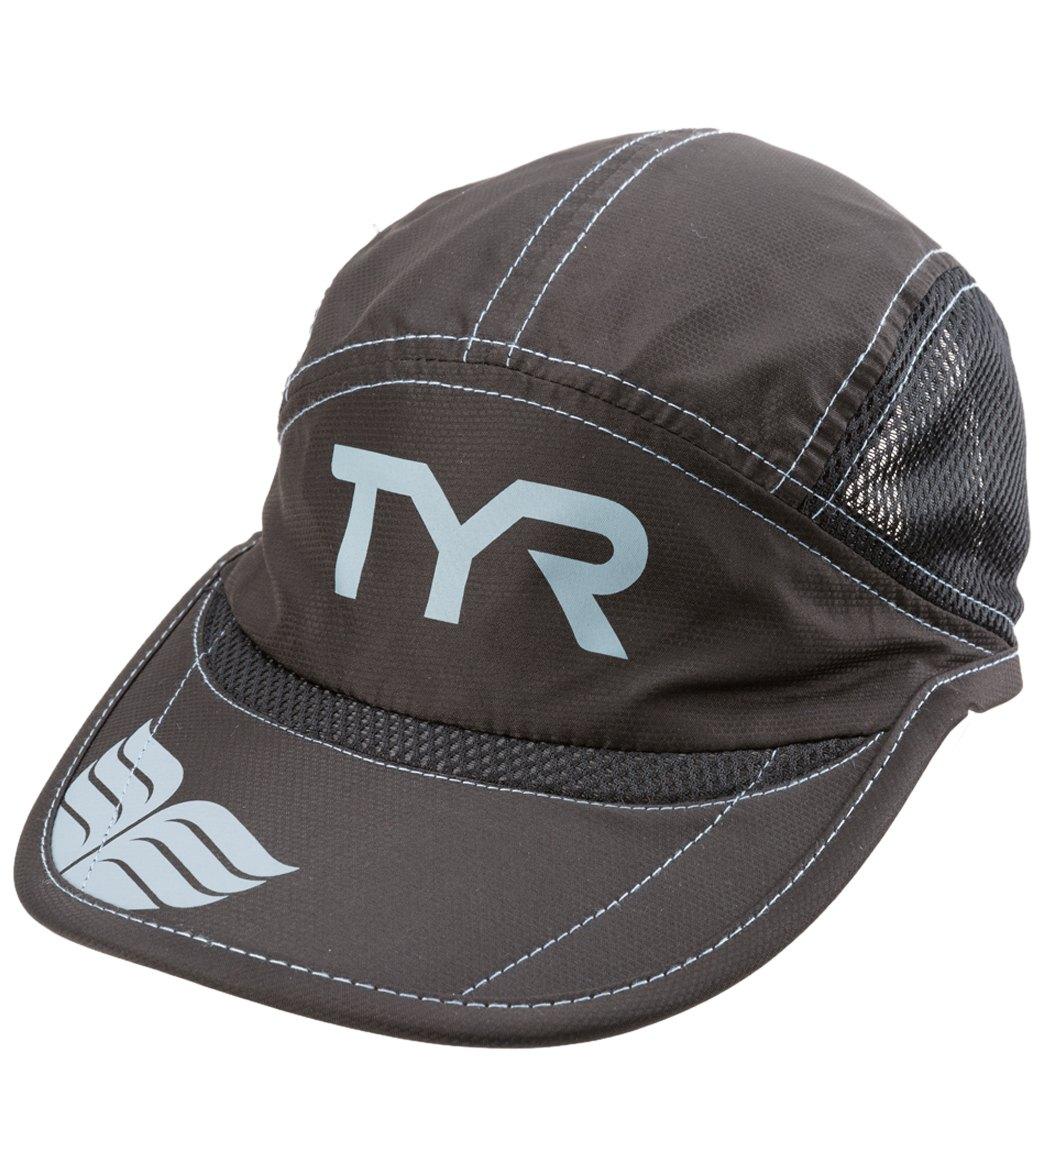 3c54216787440f TYR Running Cap at SwimOutlet.com